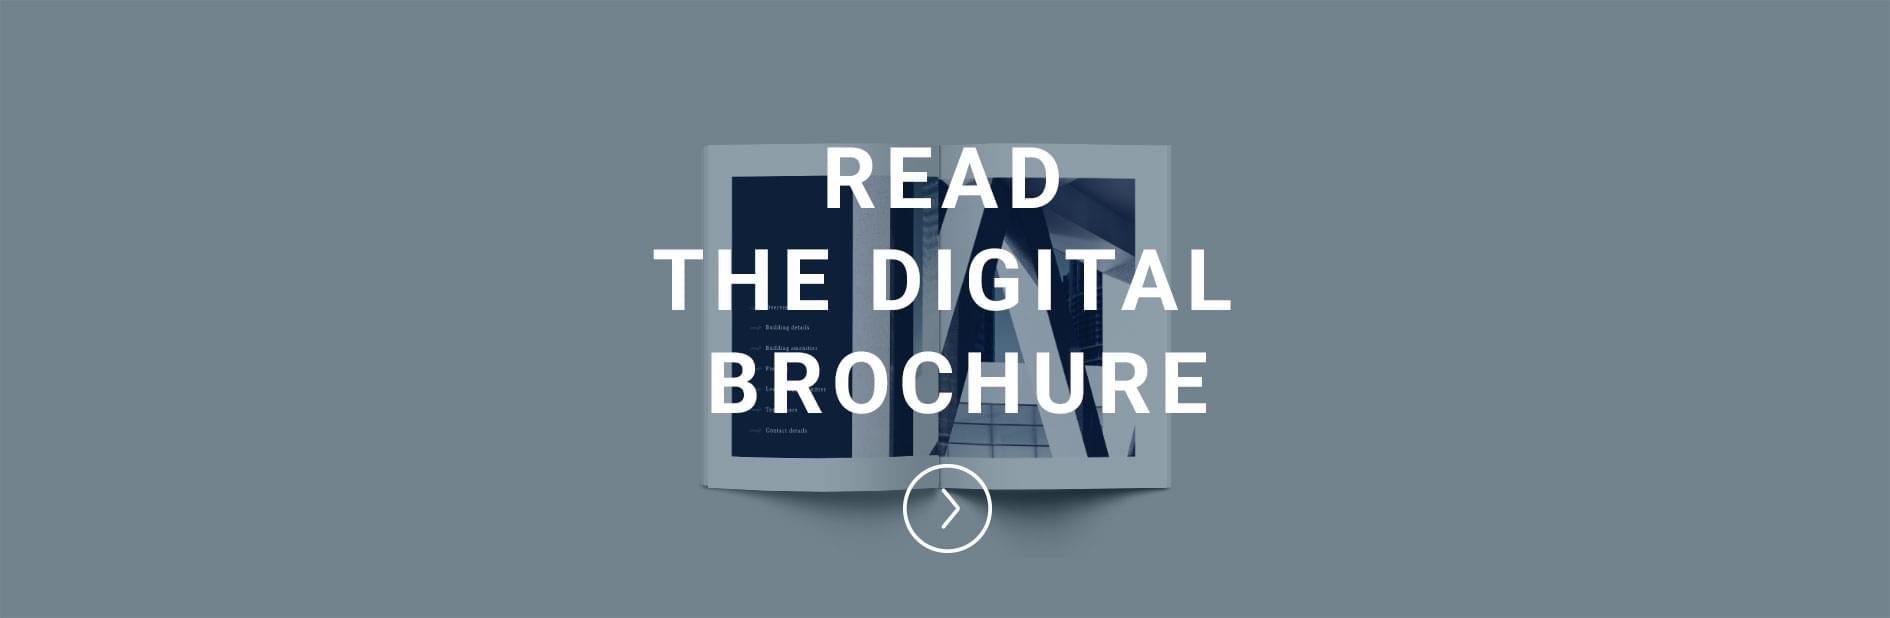 brochure-READ